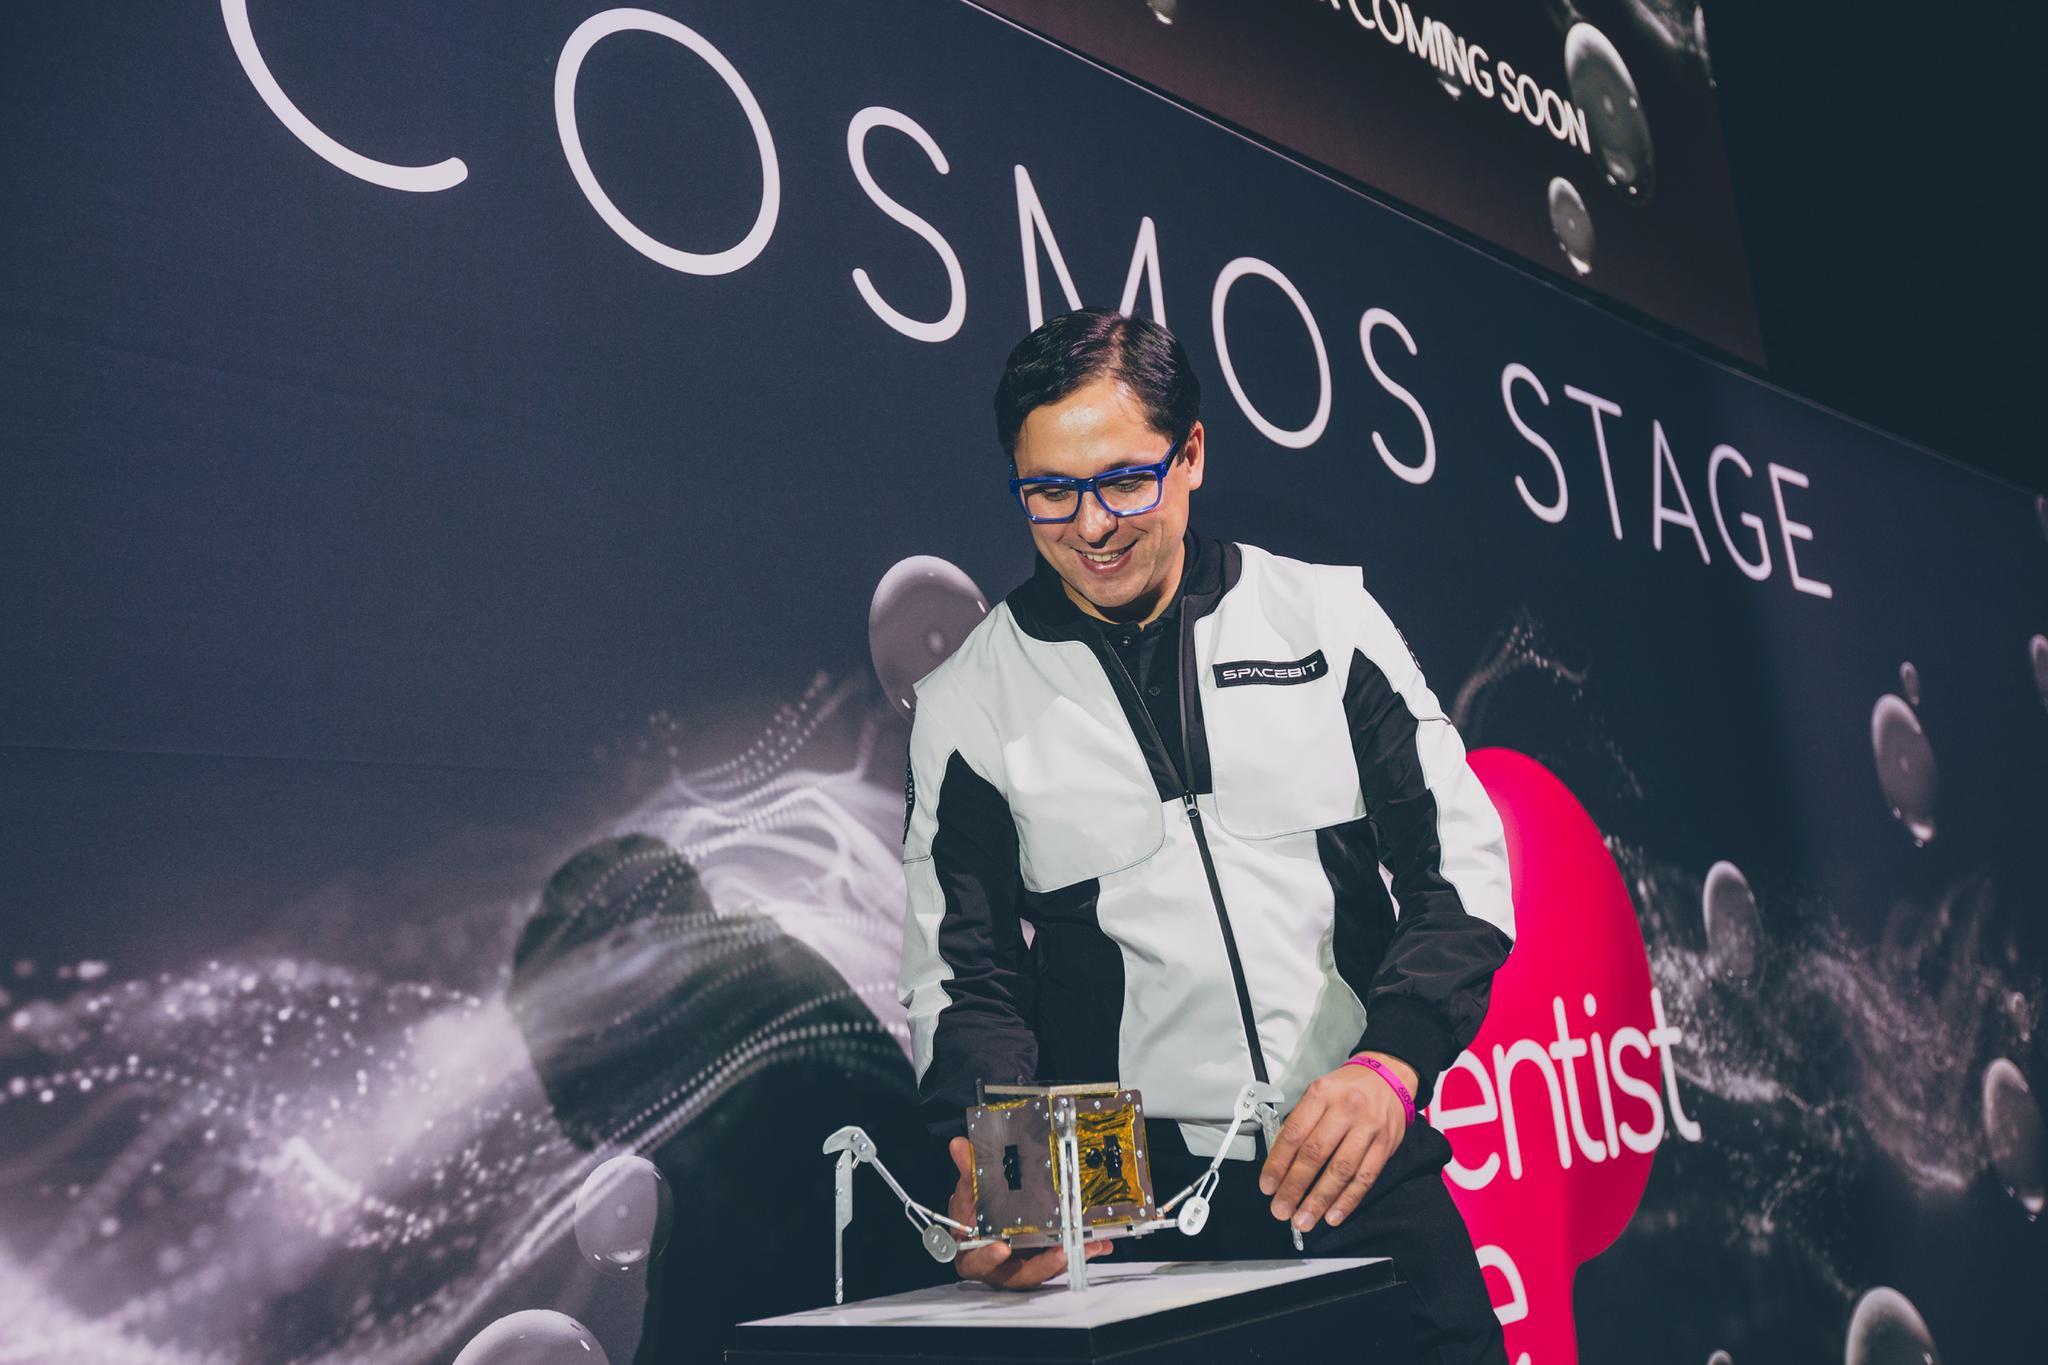 Pavlo Tanasyuk from Spacebit